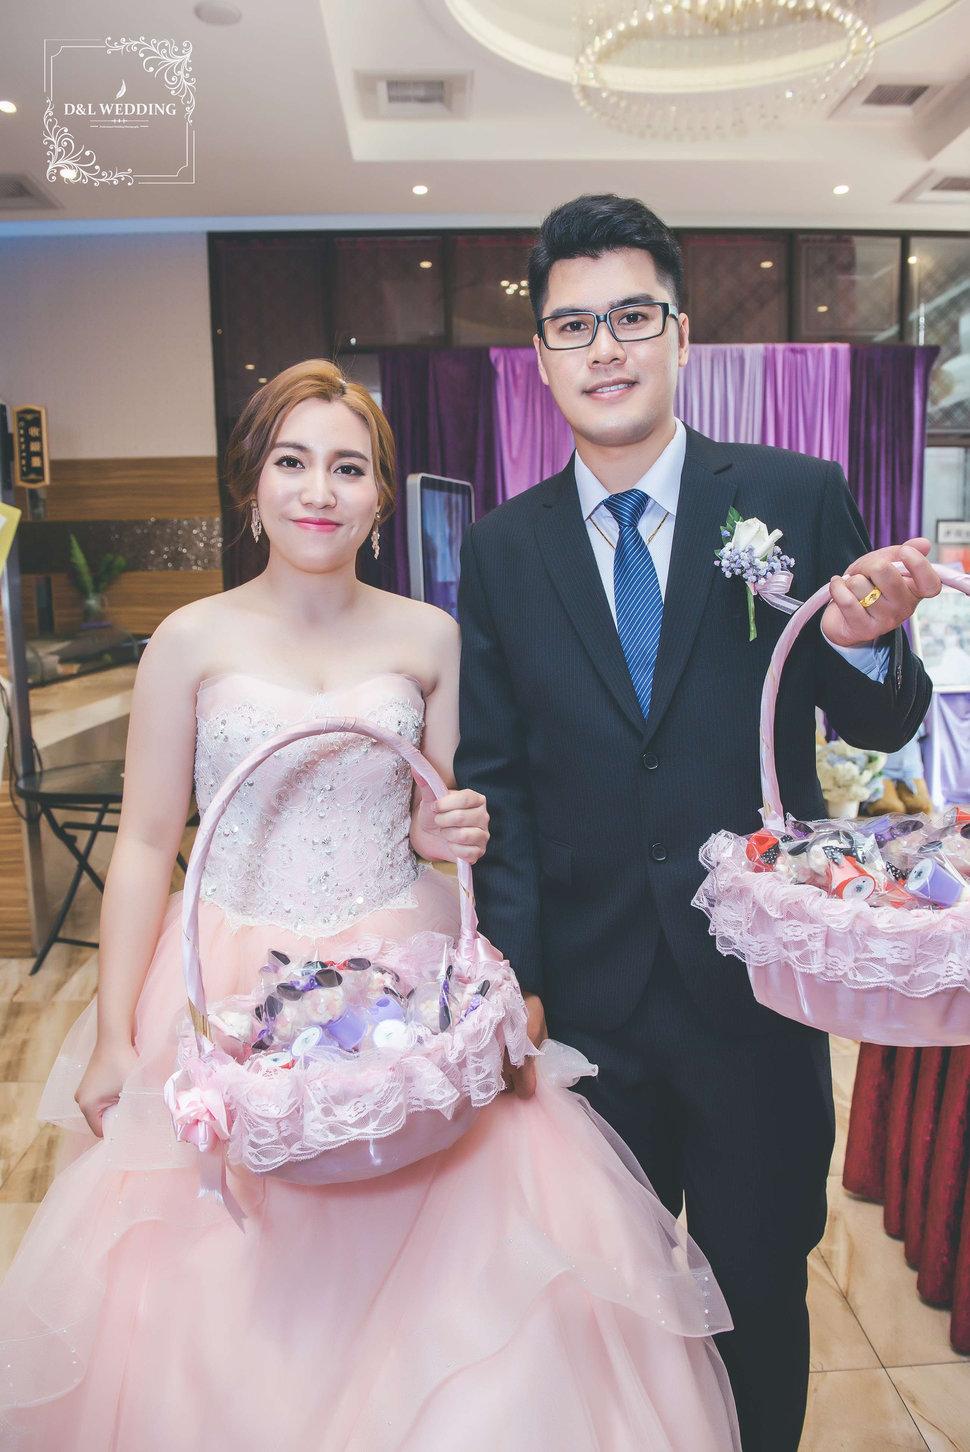 33 - D&L 婚禮事務 · 婚禮婚紗攝影 - 結婚吧